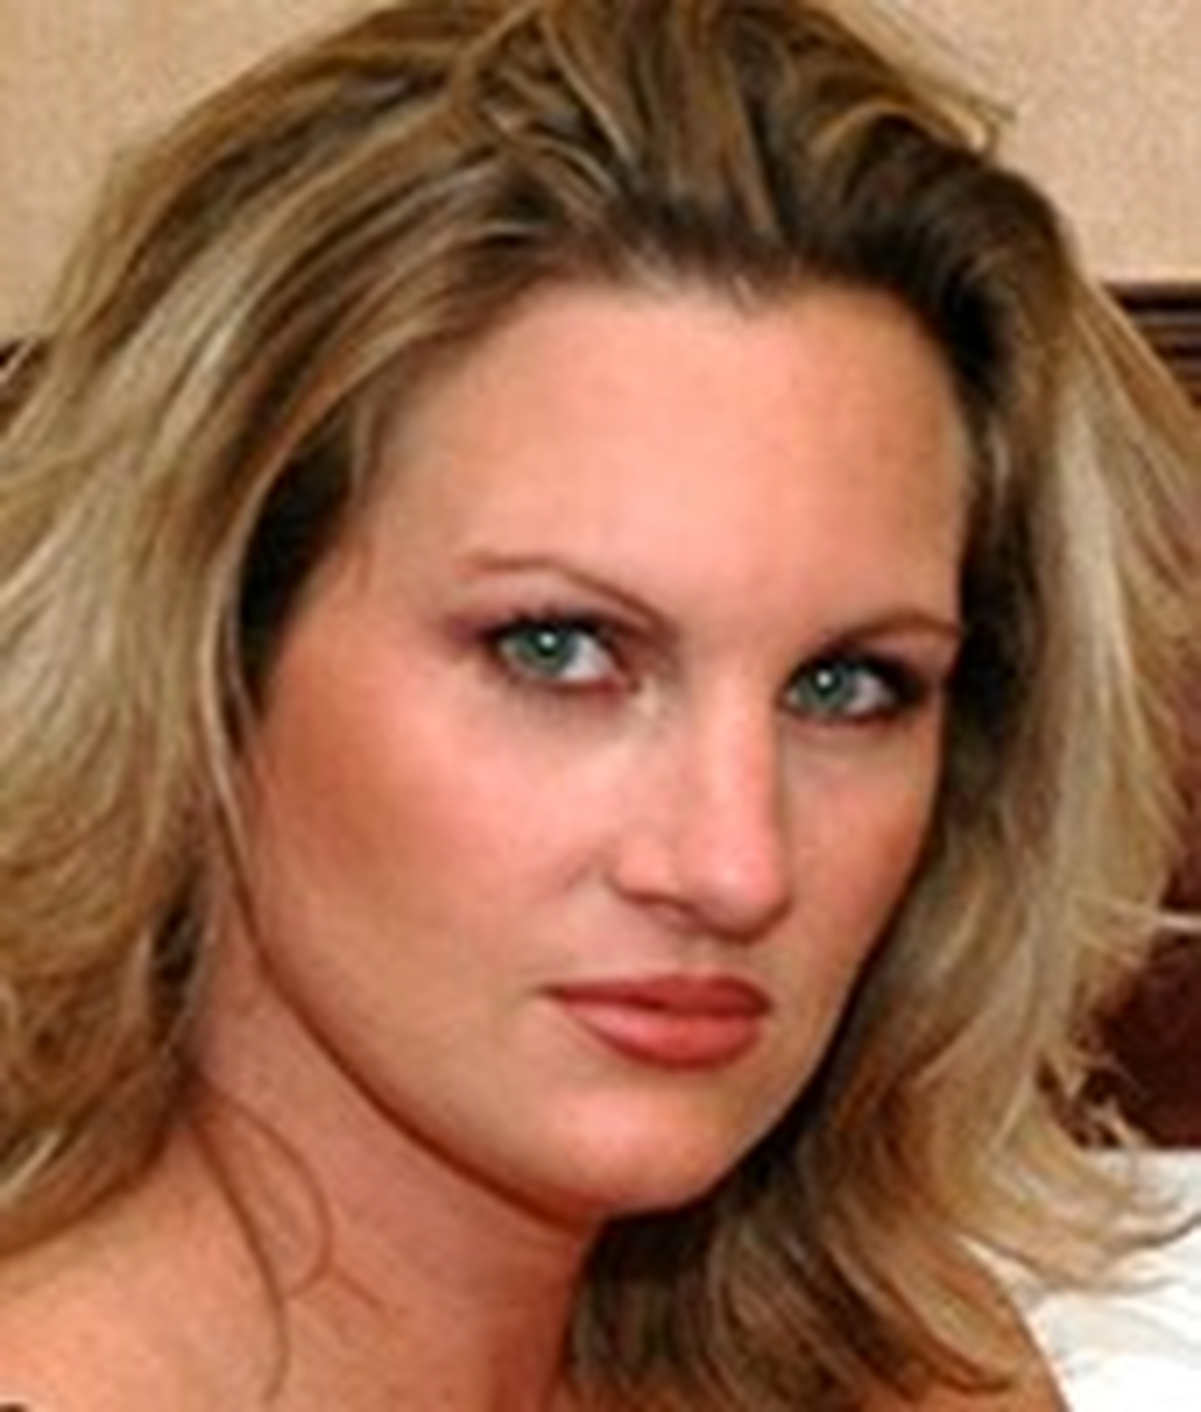 satanic sexy woman photo